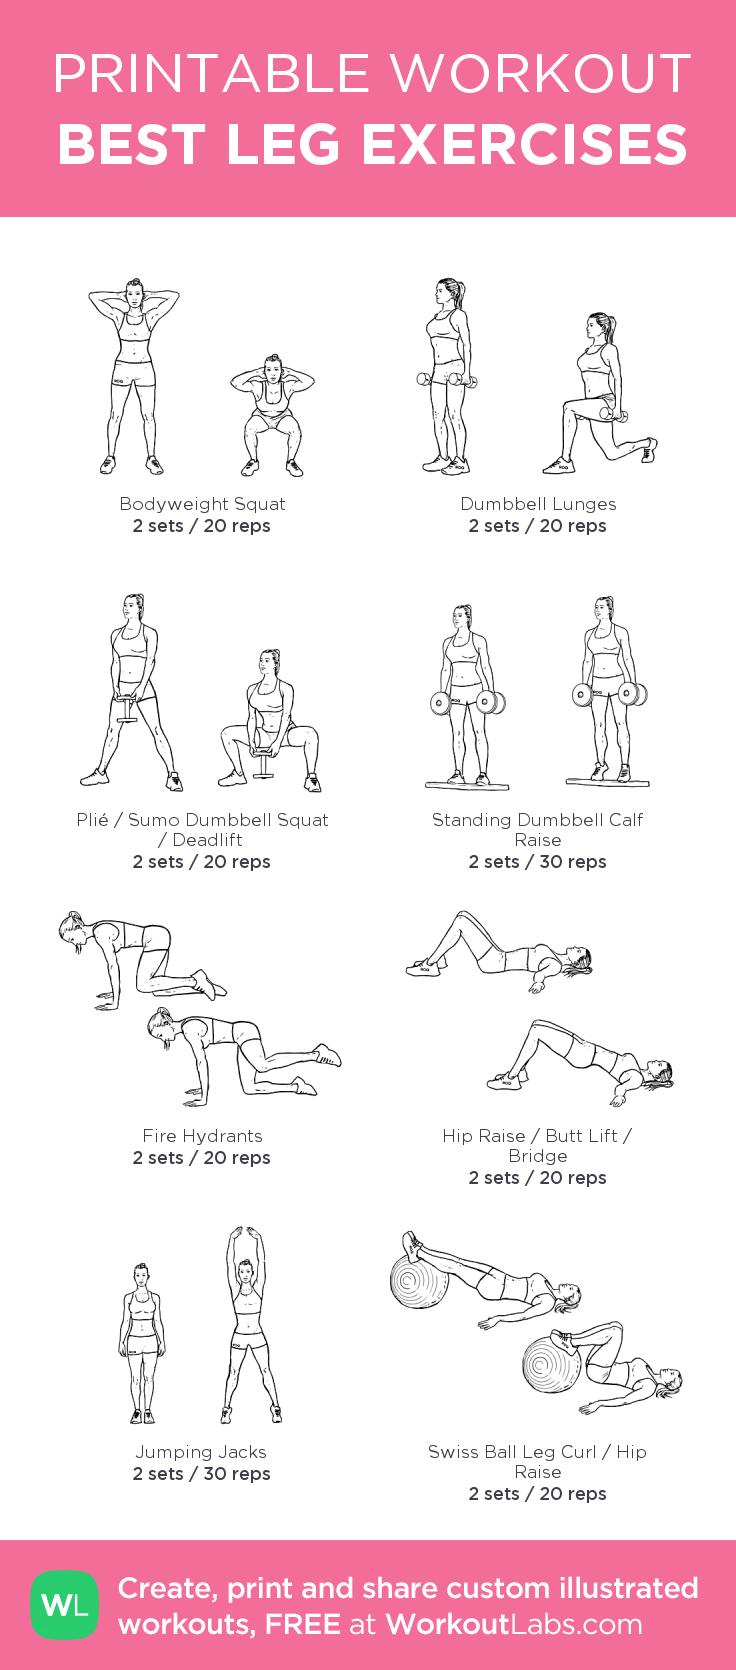 BEST LEG EXERCISES: my custom printable workout by @WorkoutLabs #workoutlabs #customworkout